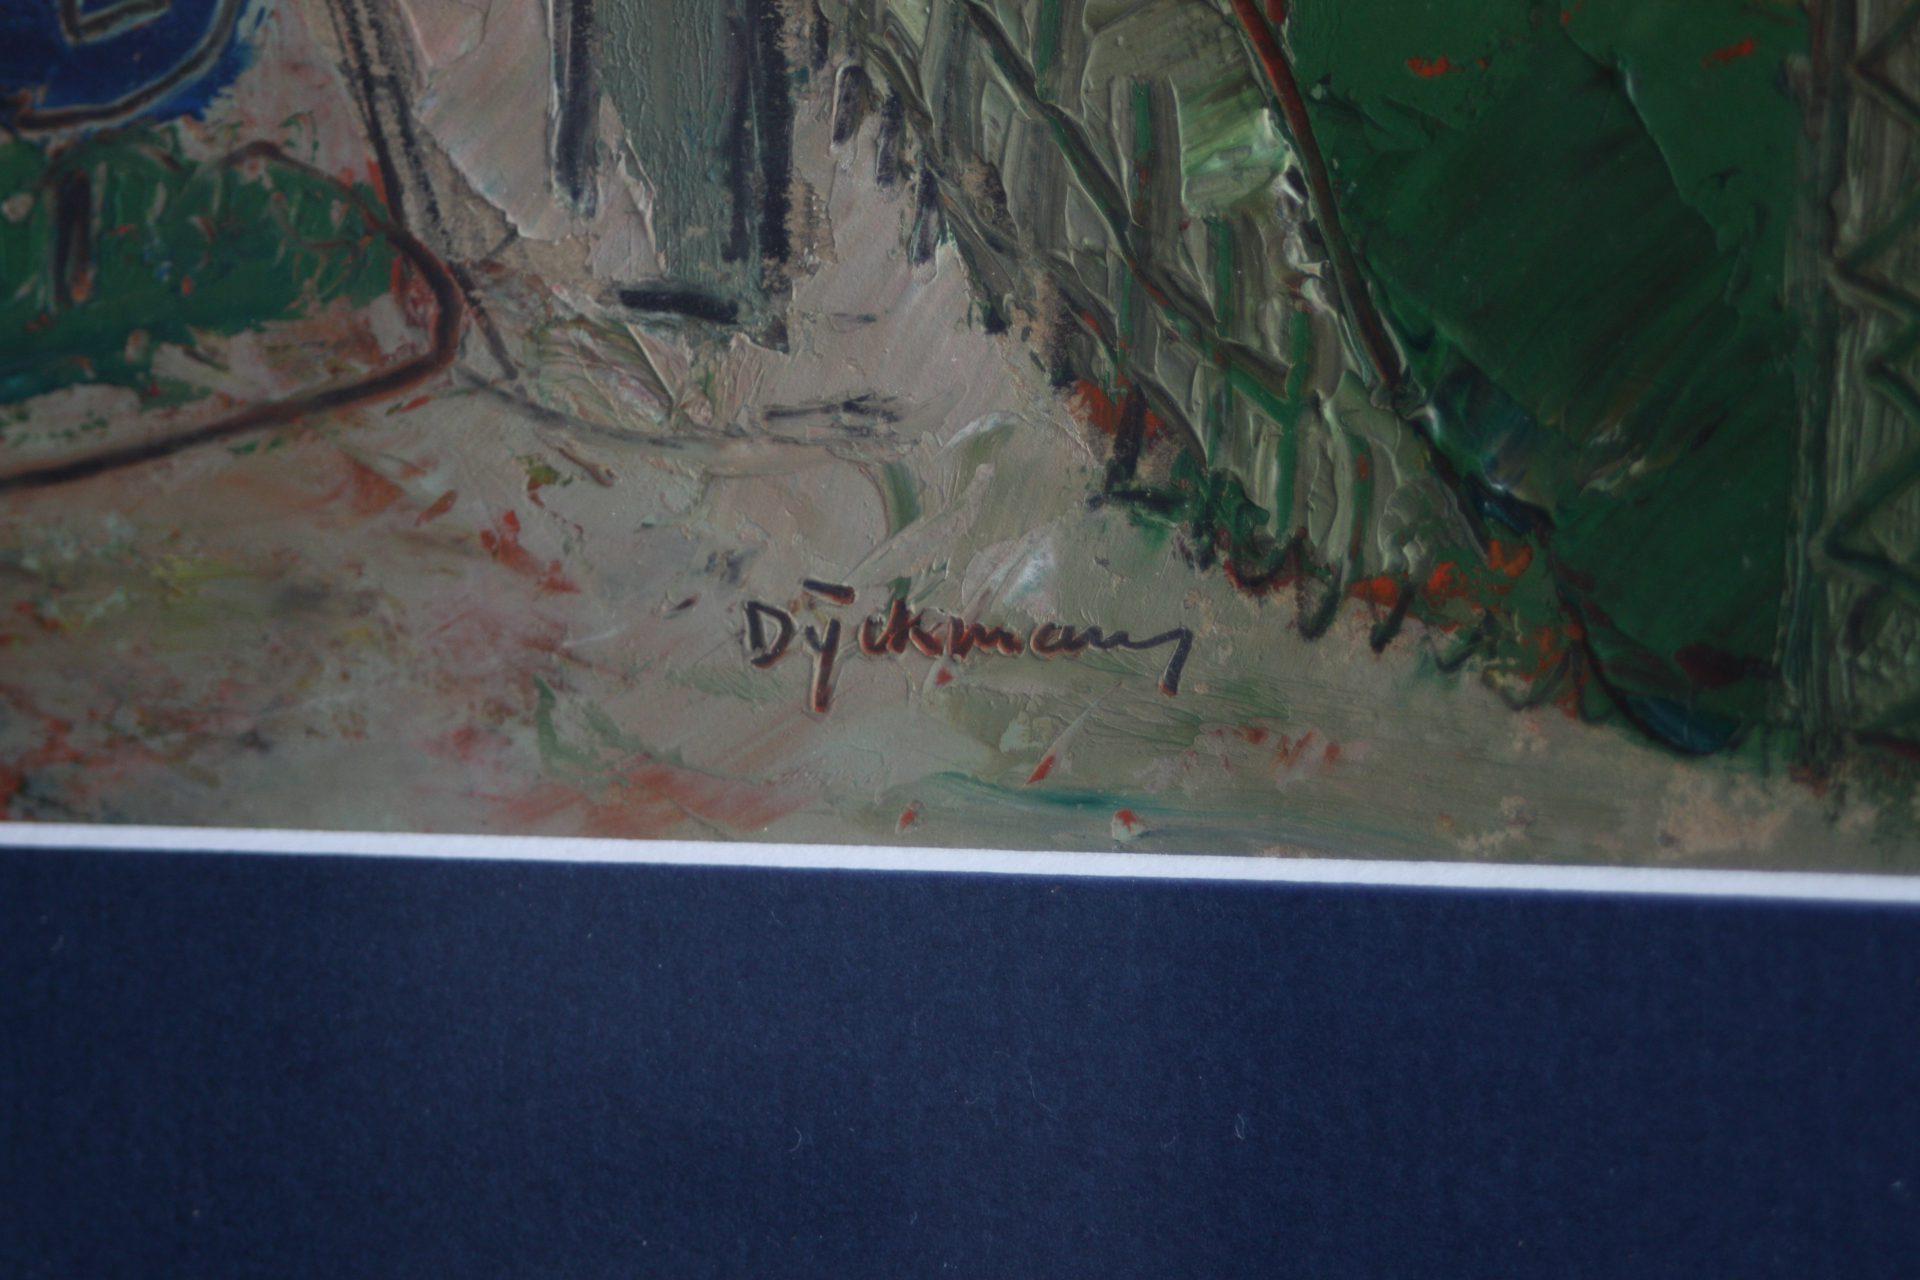 Bruno Dyckmans 03